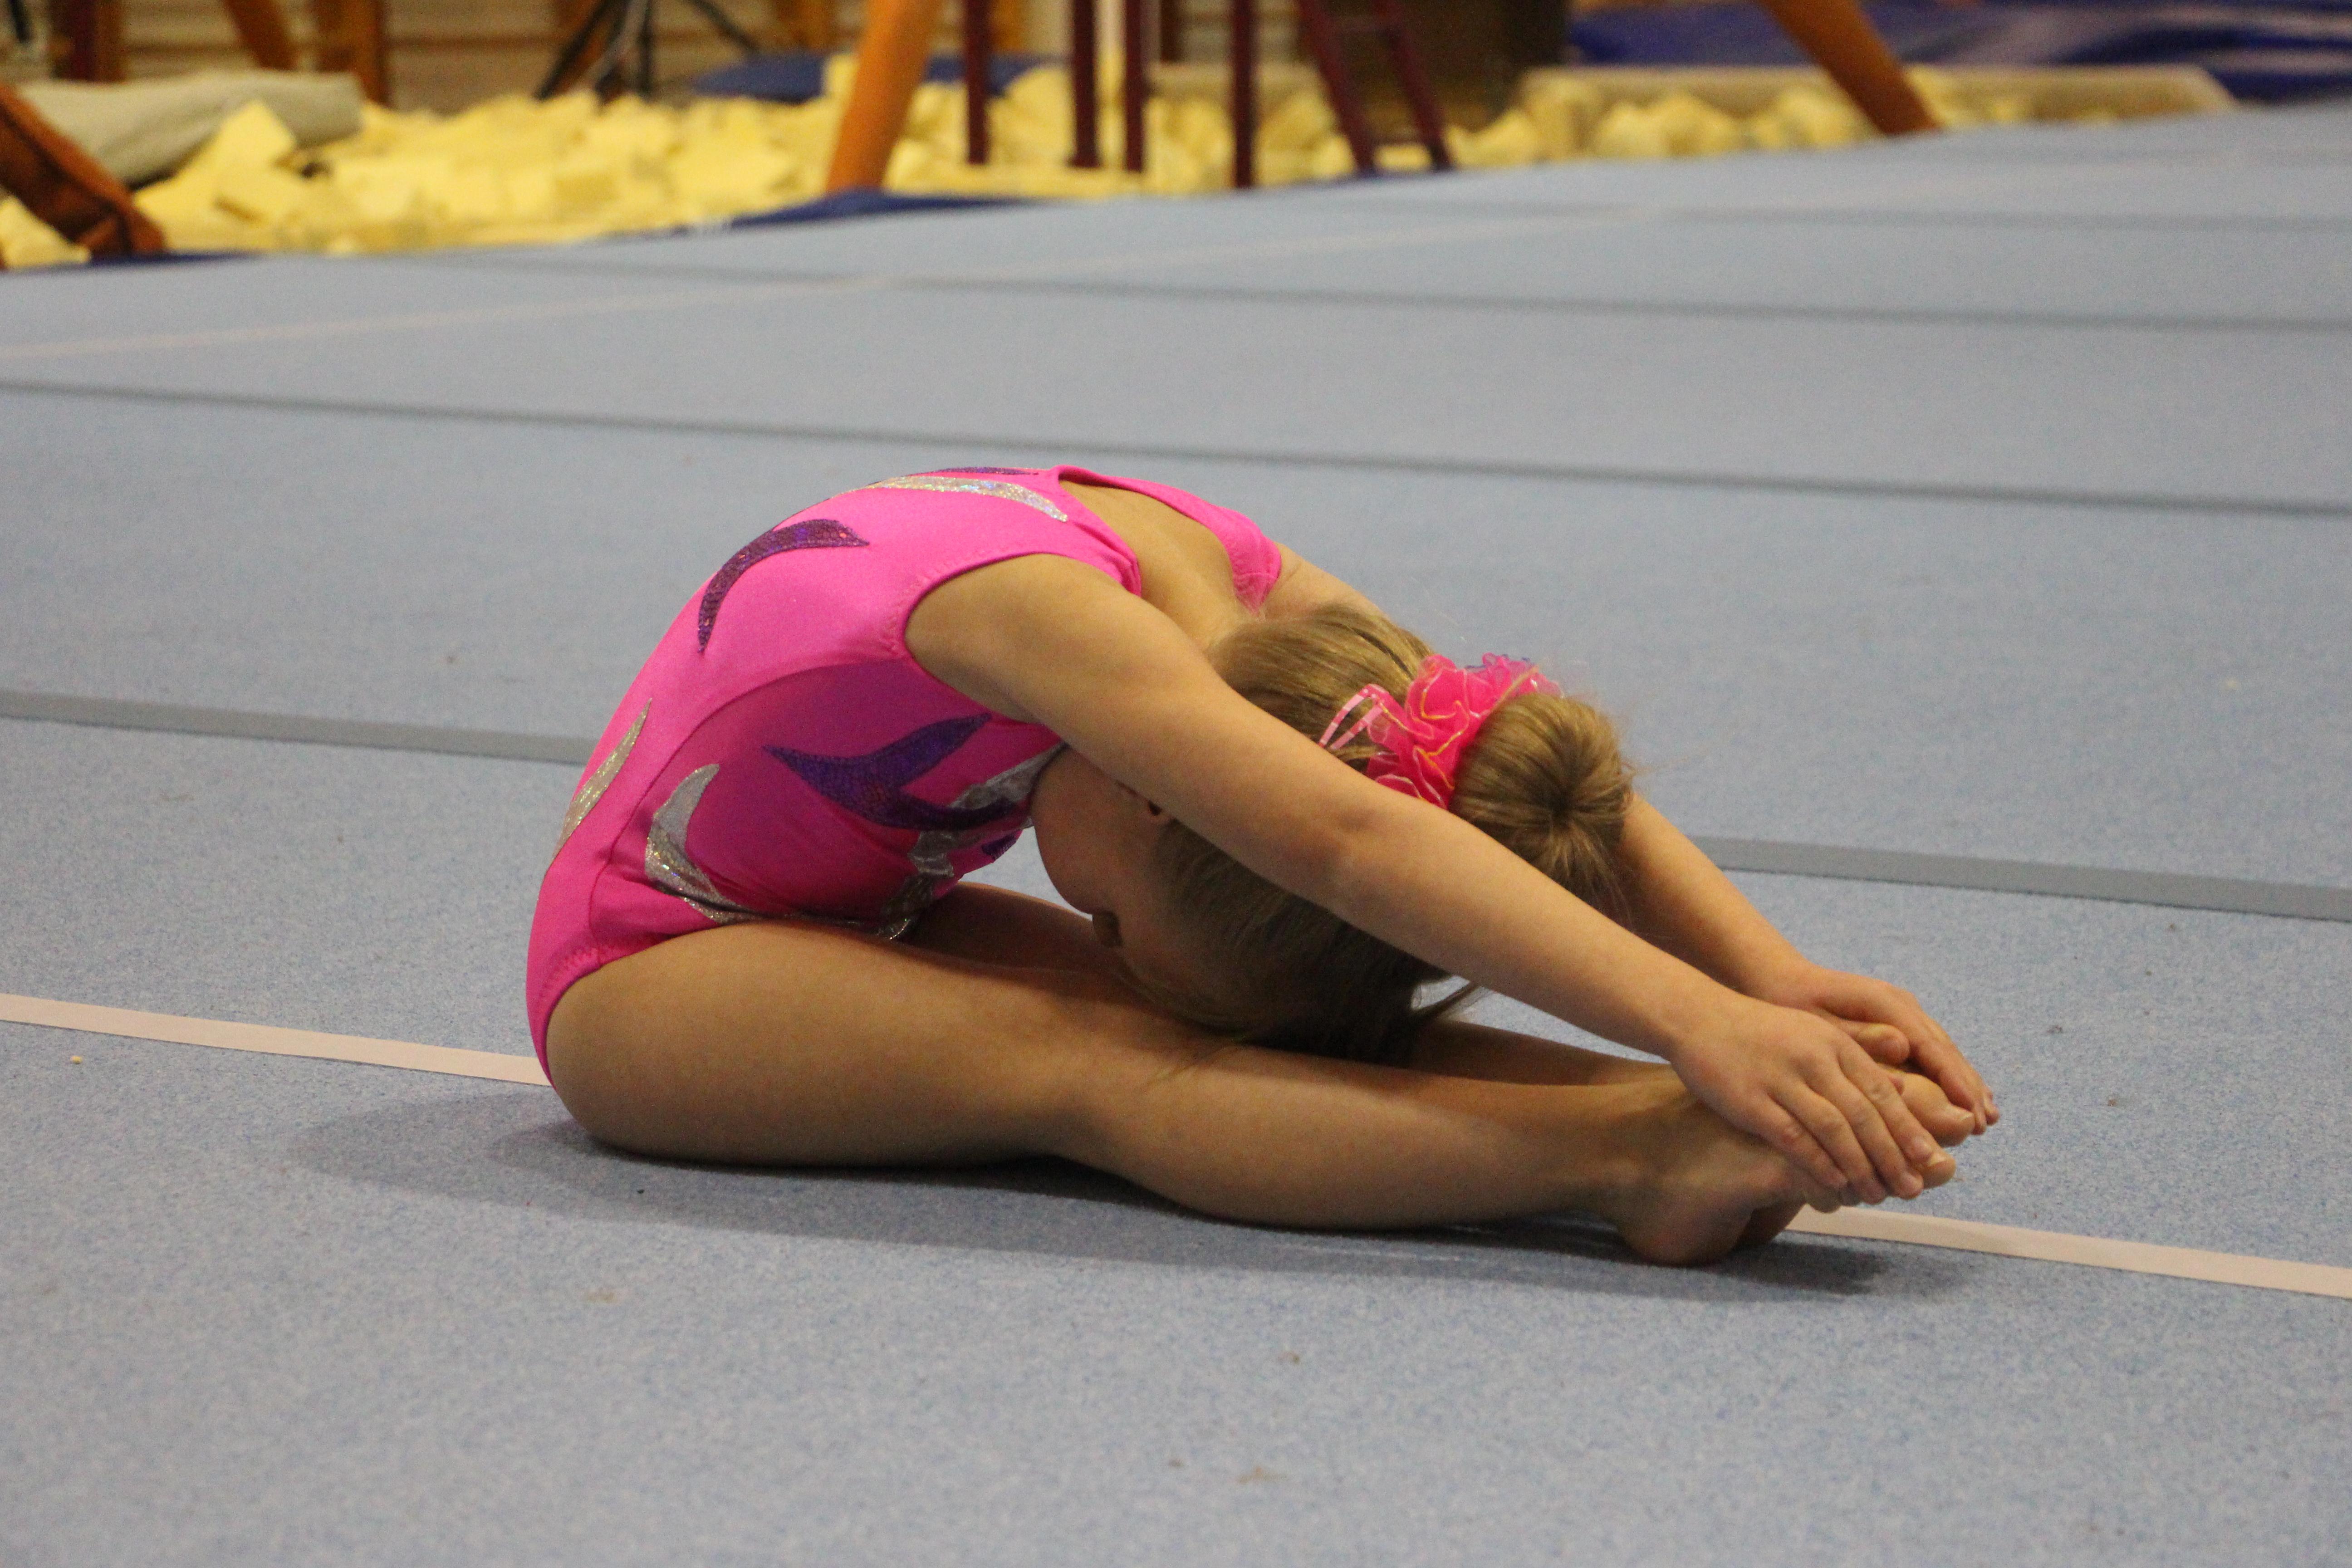 юбки спустив видео гимнастика девушки нигилист, судя твоим